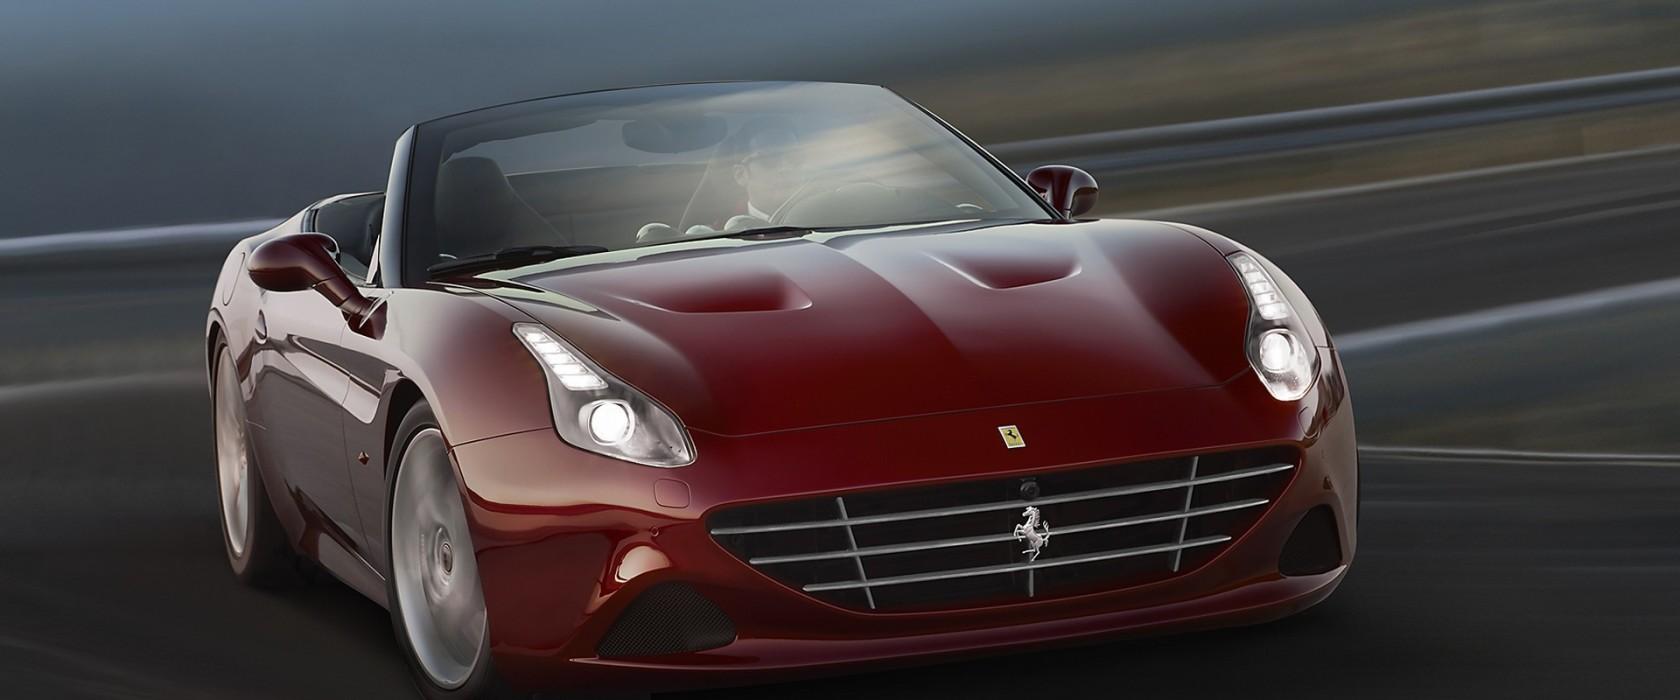 FerrariCaliforniaTHandlingSpeciale-apertura